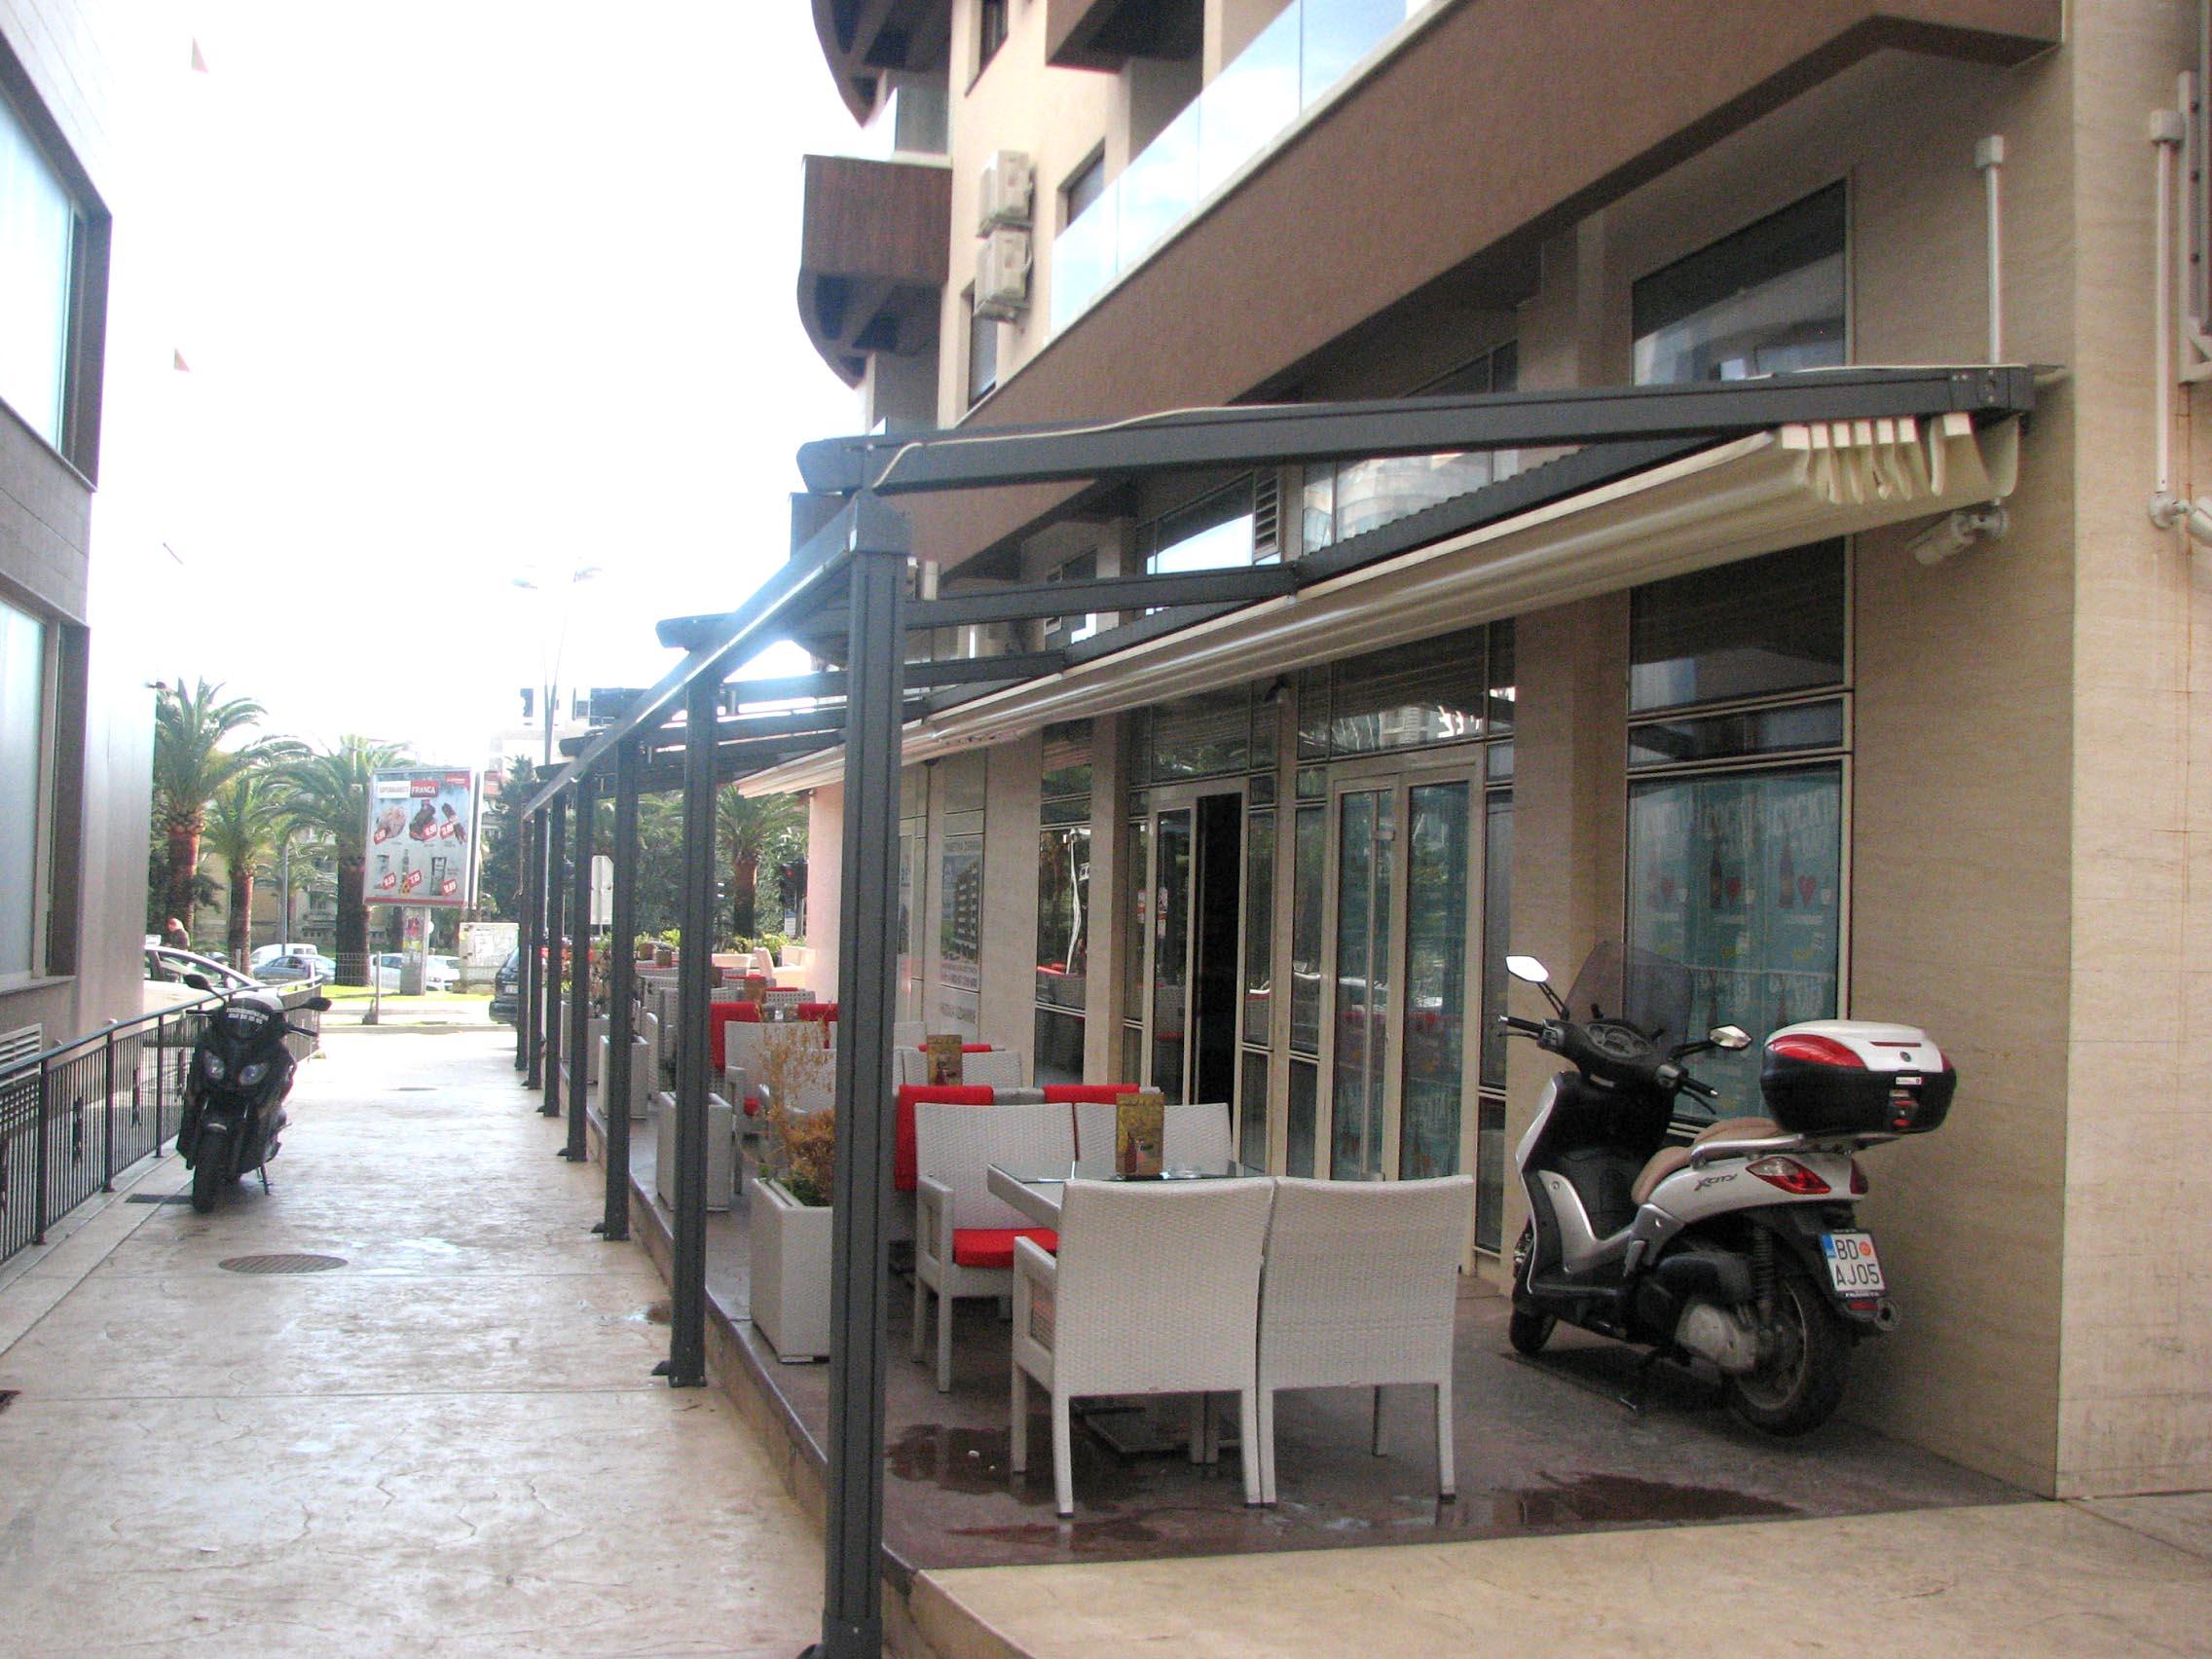 Poslovni objekat ''Bilijar klub'' u Budvi